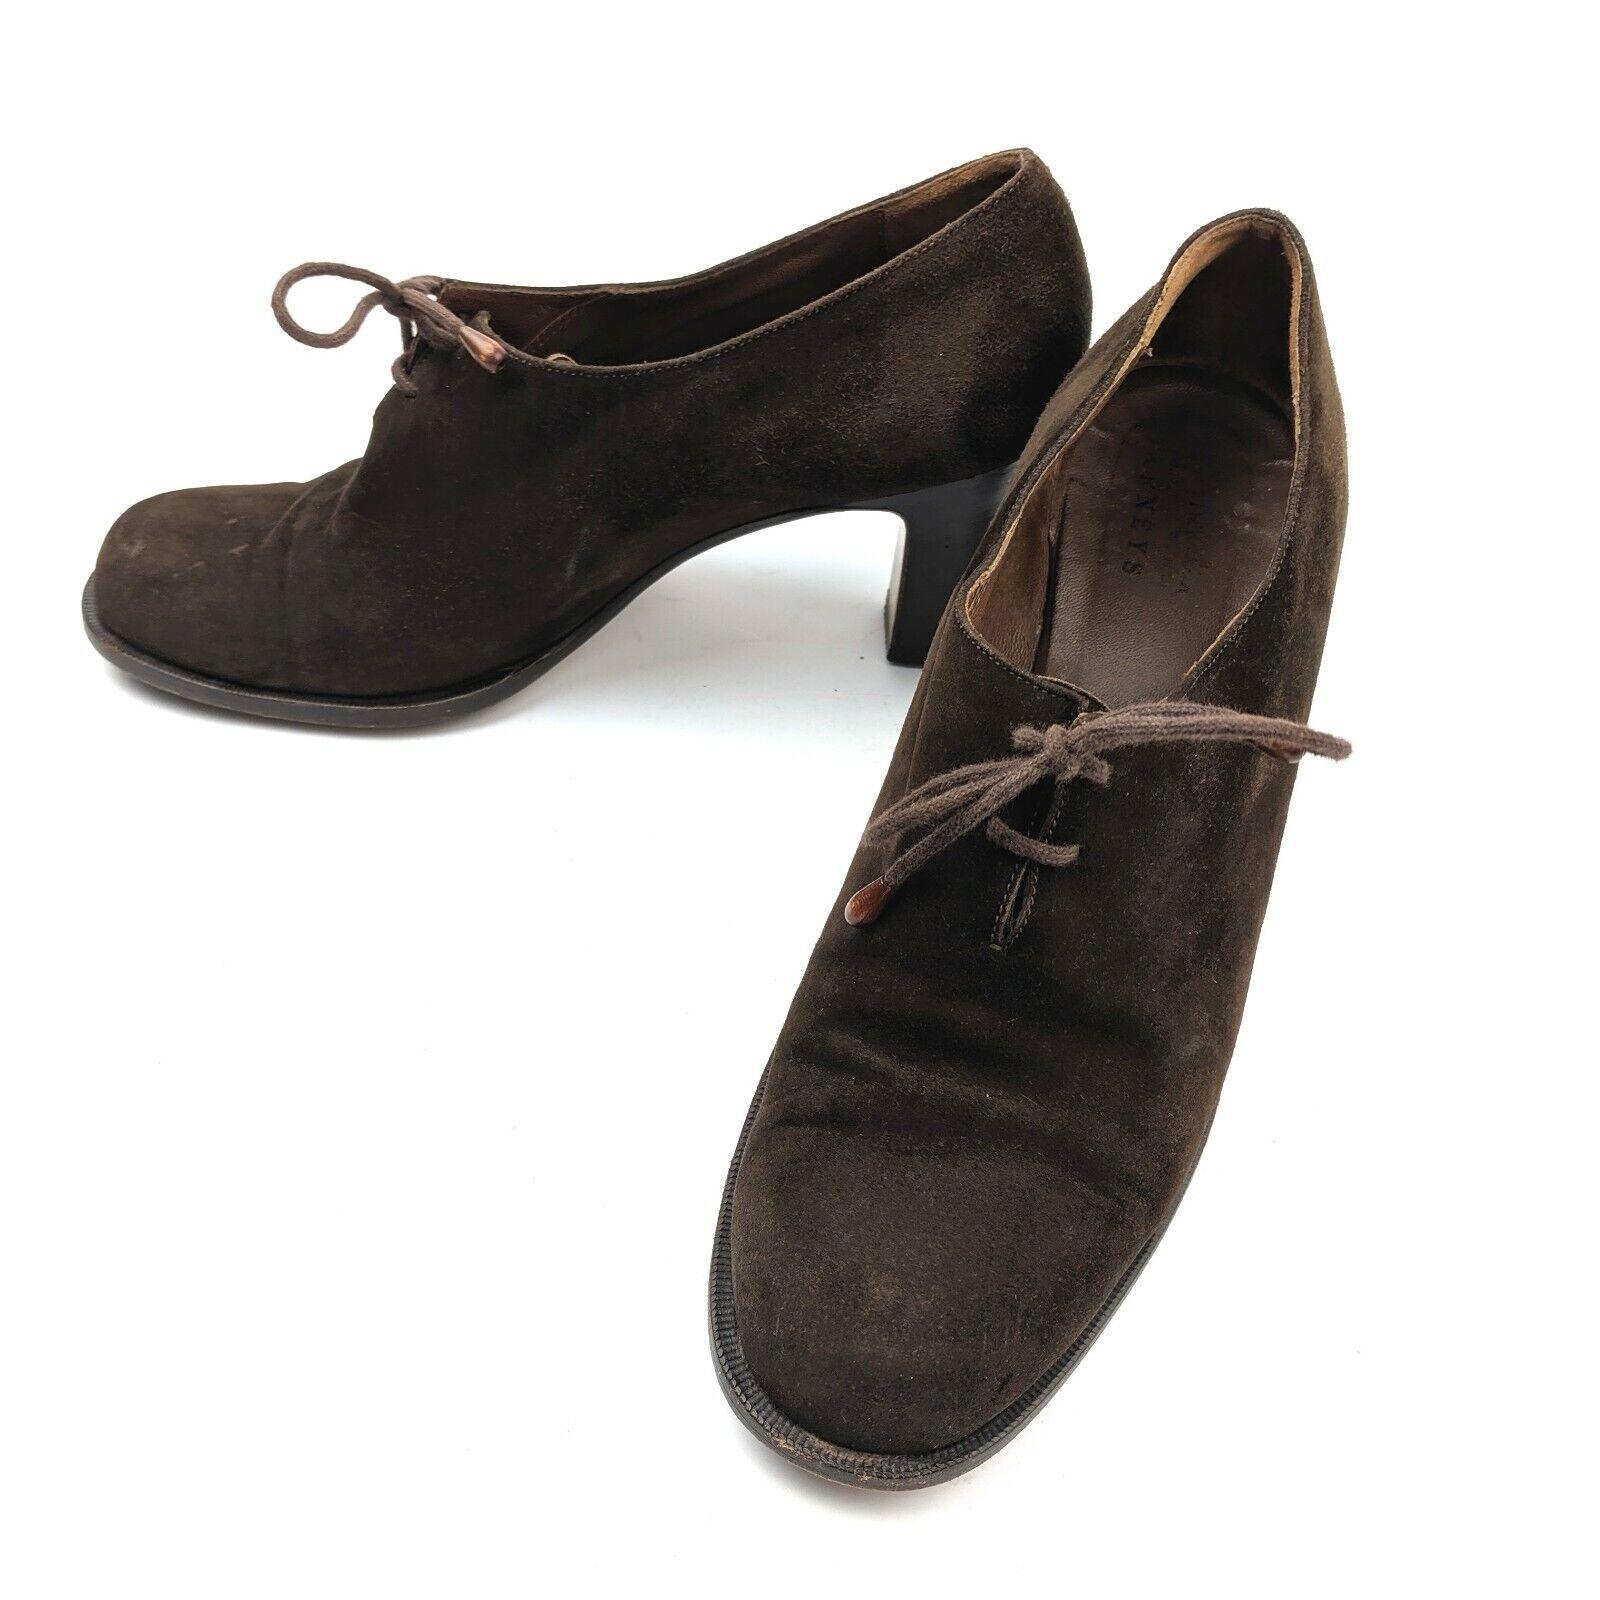 Vintage Henry Beguelin for Barneys  Brown Suede Leather Pumps Heels Size 9